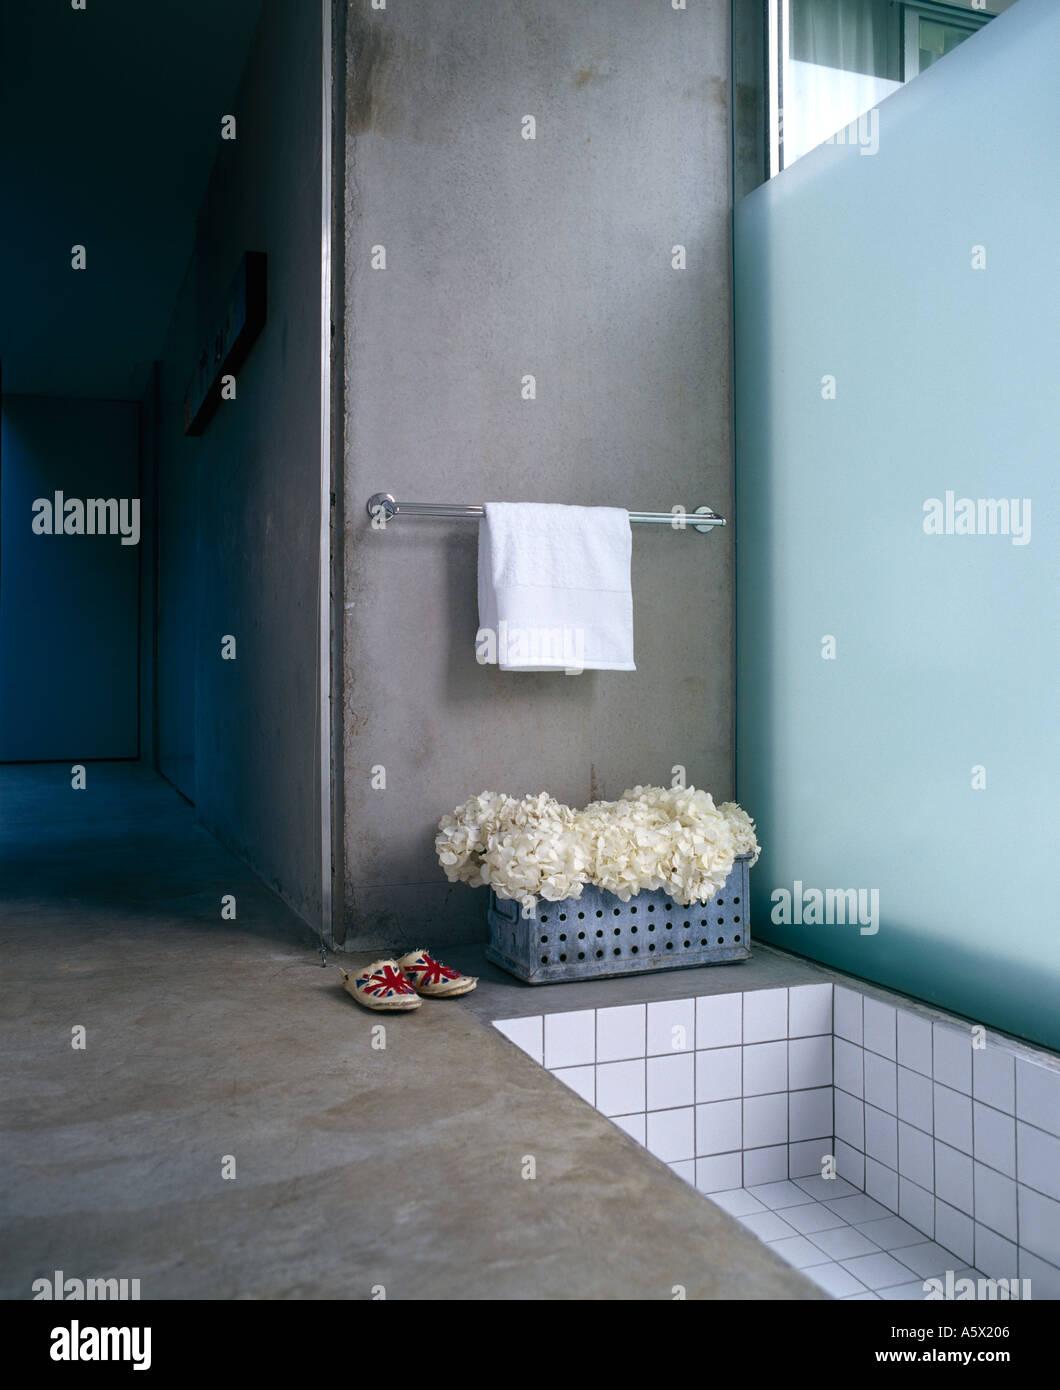 Sunken Baths Stock Photos & Sunken Baths Stock Images - Alamy